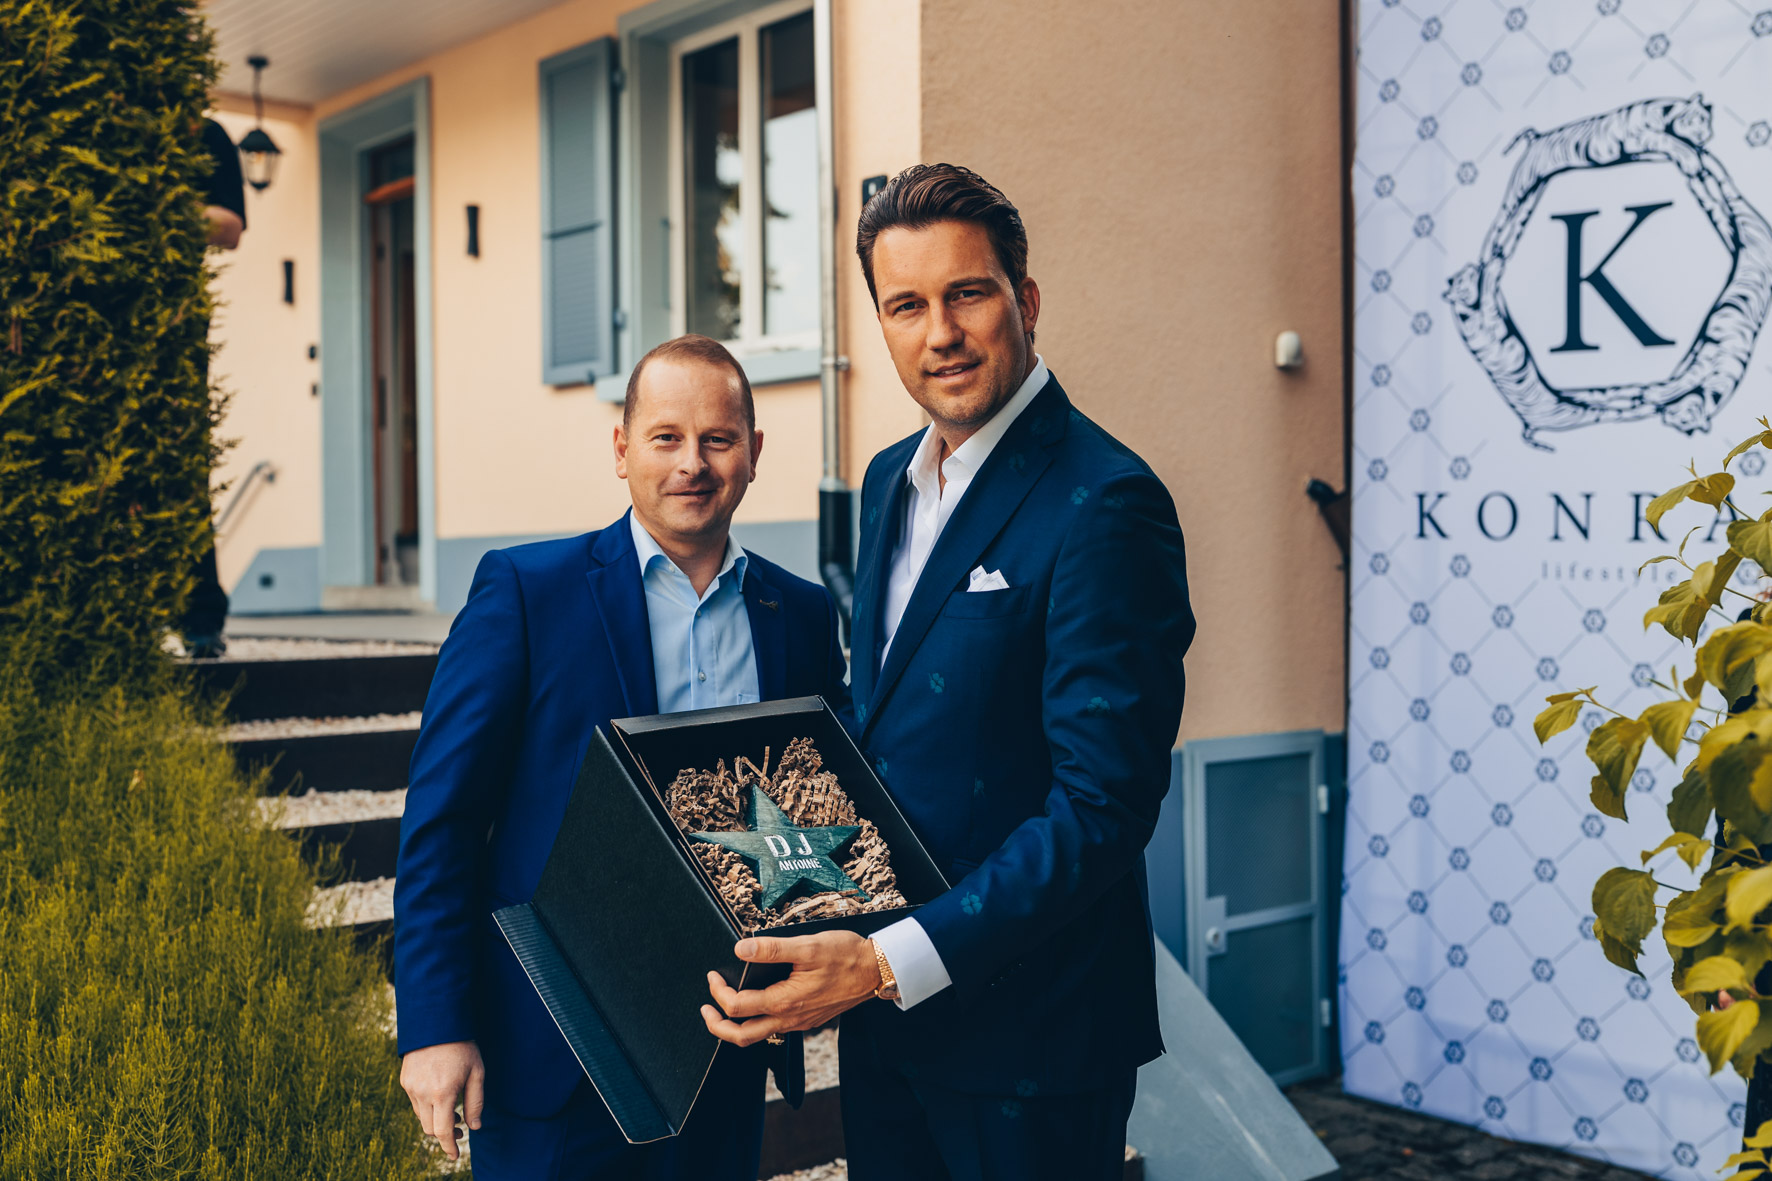 Konrad-lifestyle-art-basel-%22gold-member-experience%22-2019-8.jpg